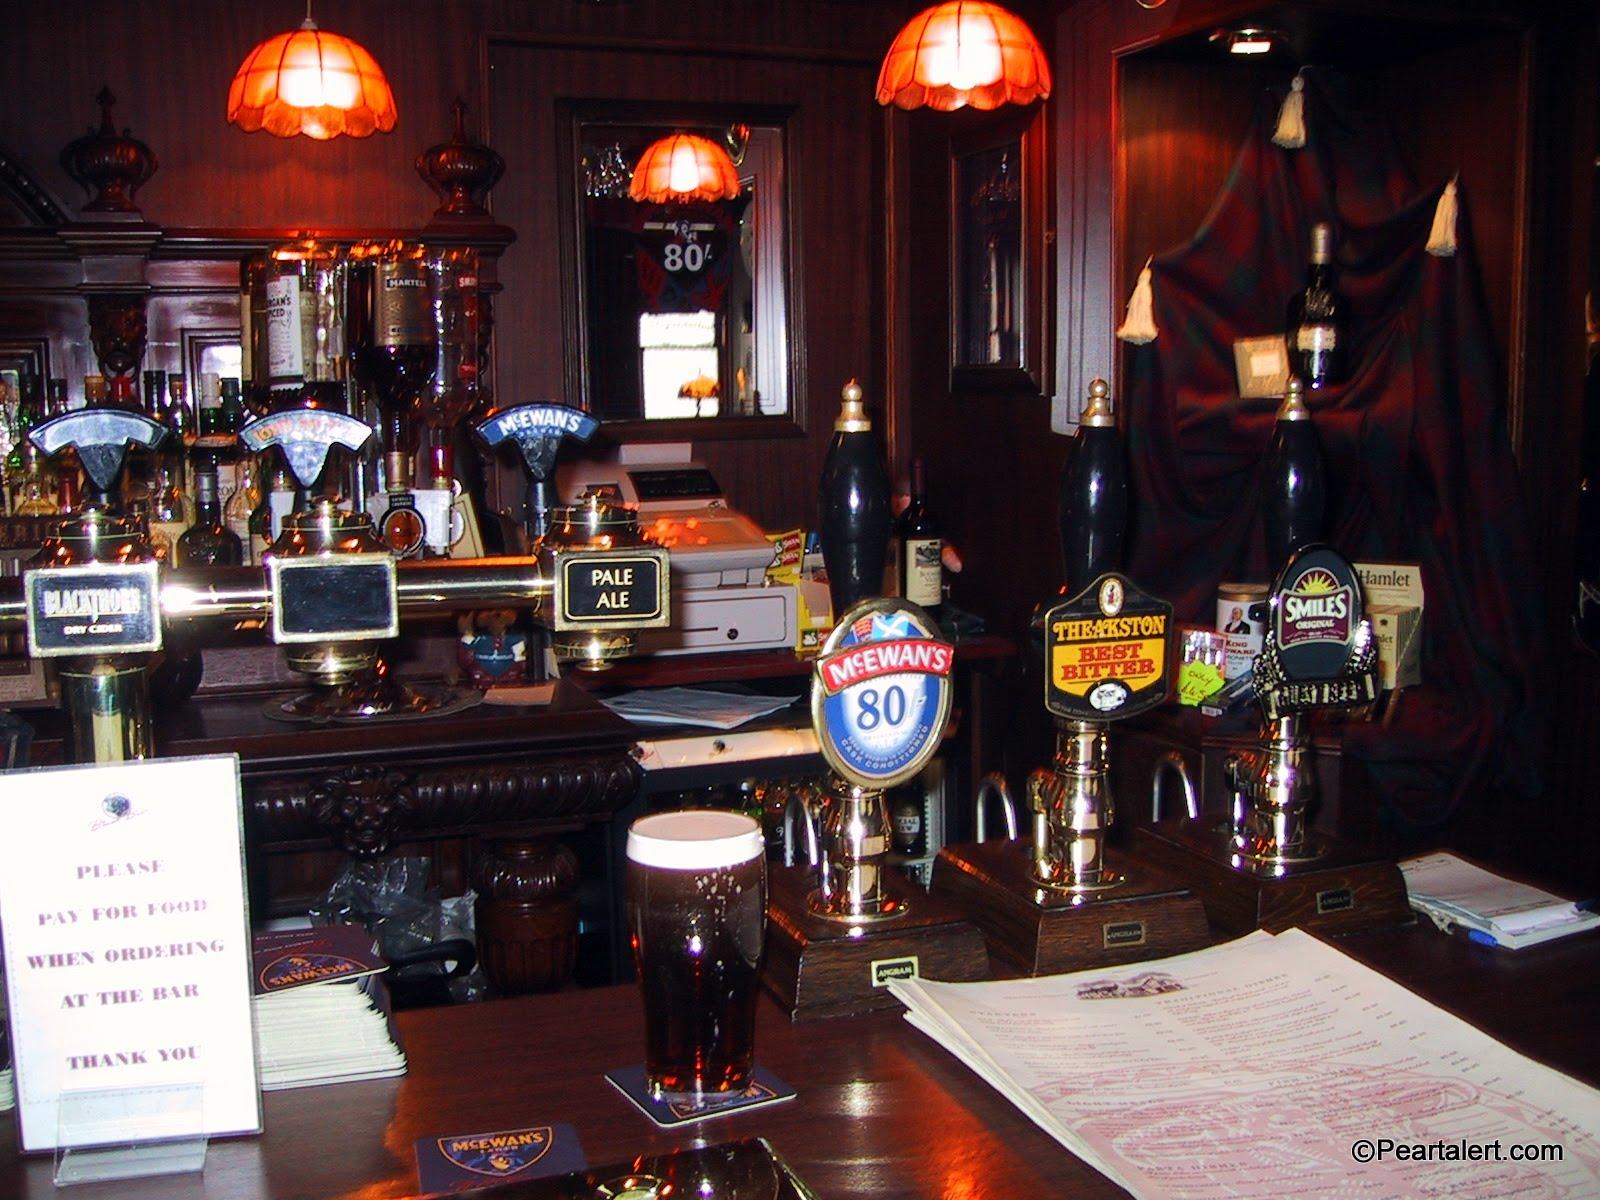 http://www.sloshspot.com/blog/11-19-2008/Around-the-World-in-116-Beers-80